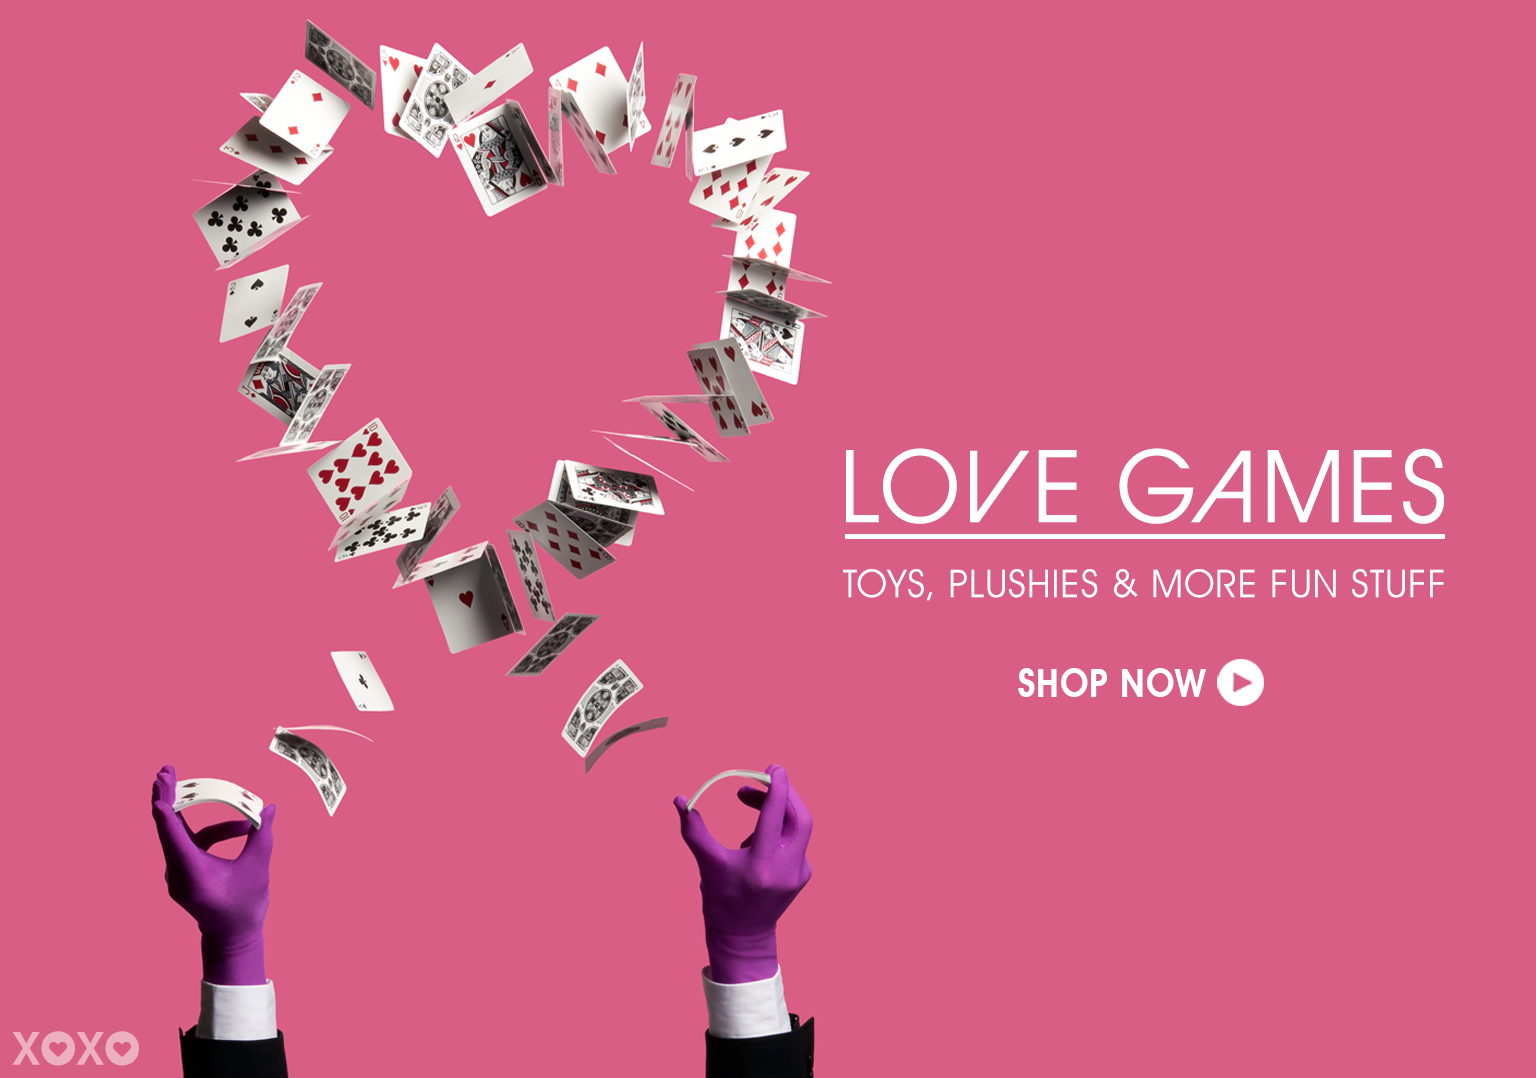 Love Games. Shop Toys, Plushies & More Fun Stuff.